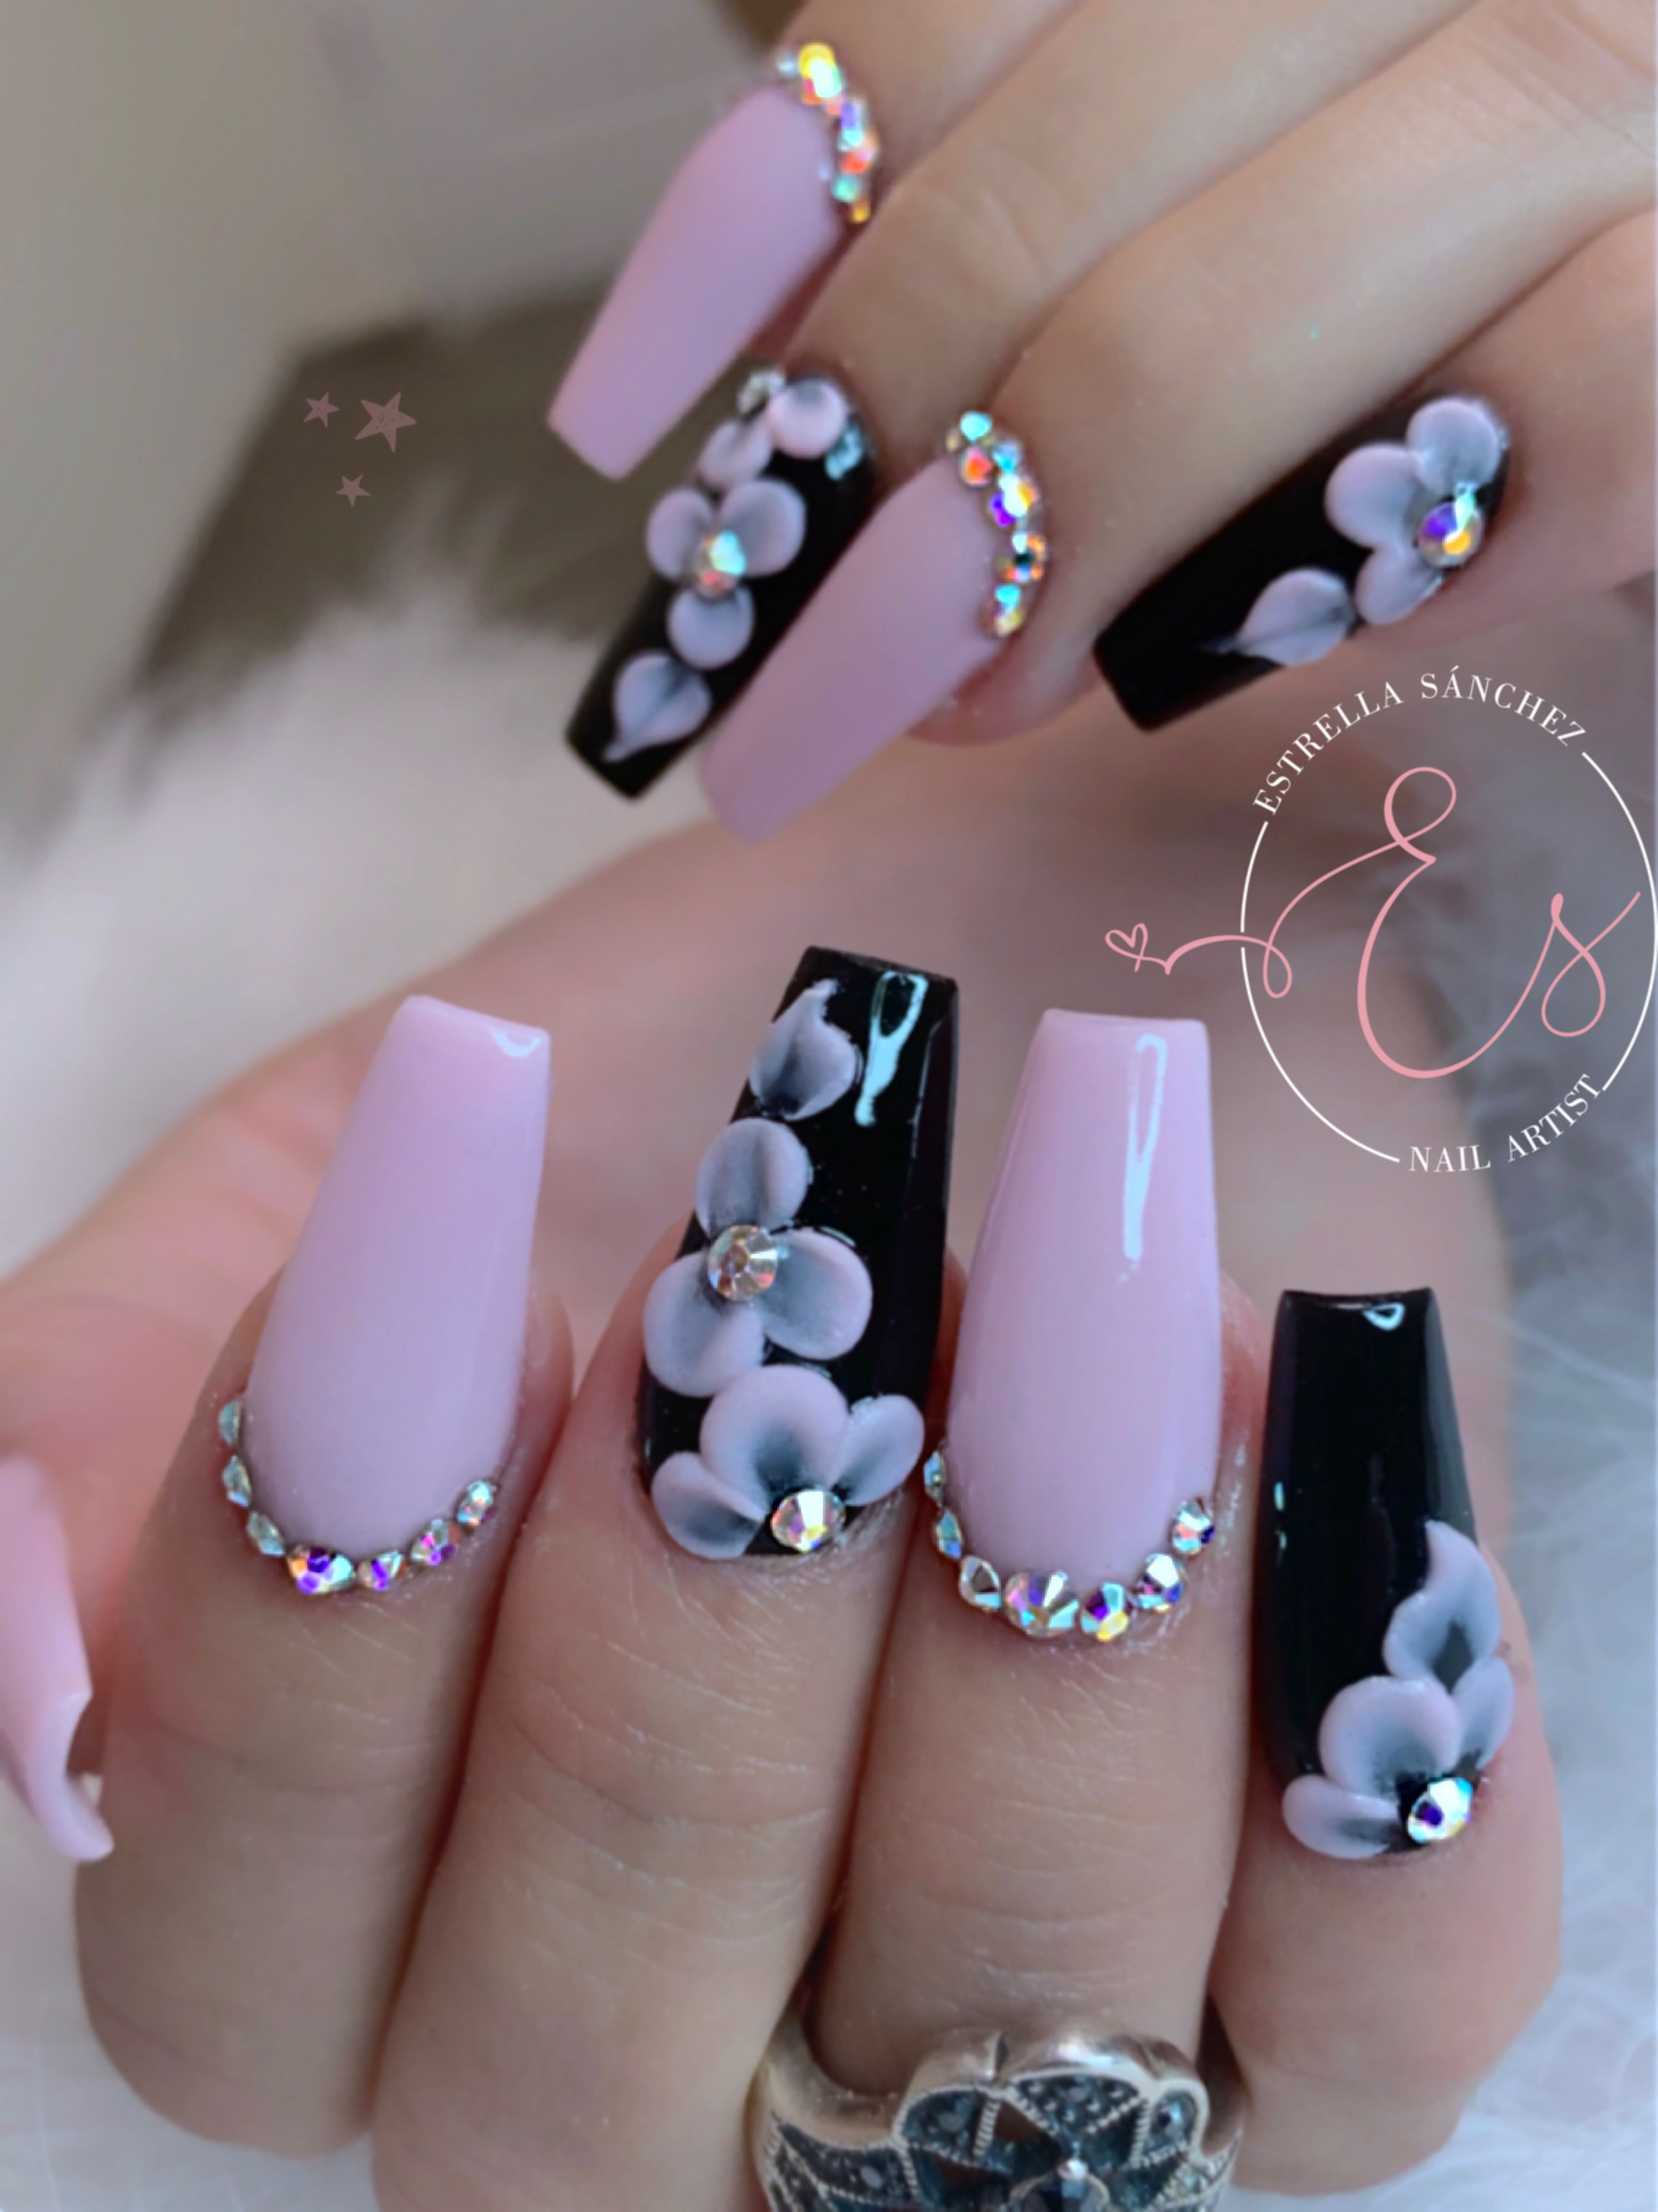 Blacknails Pinknails Acrylicnails Pinkandblack Uñas